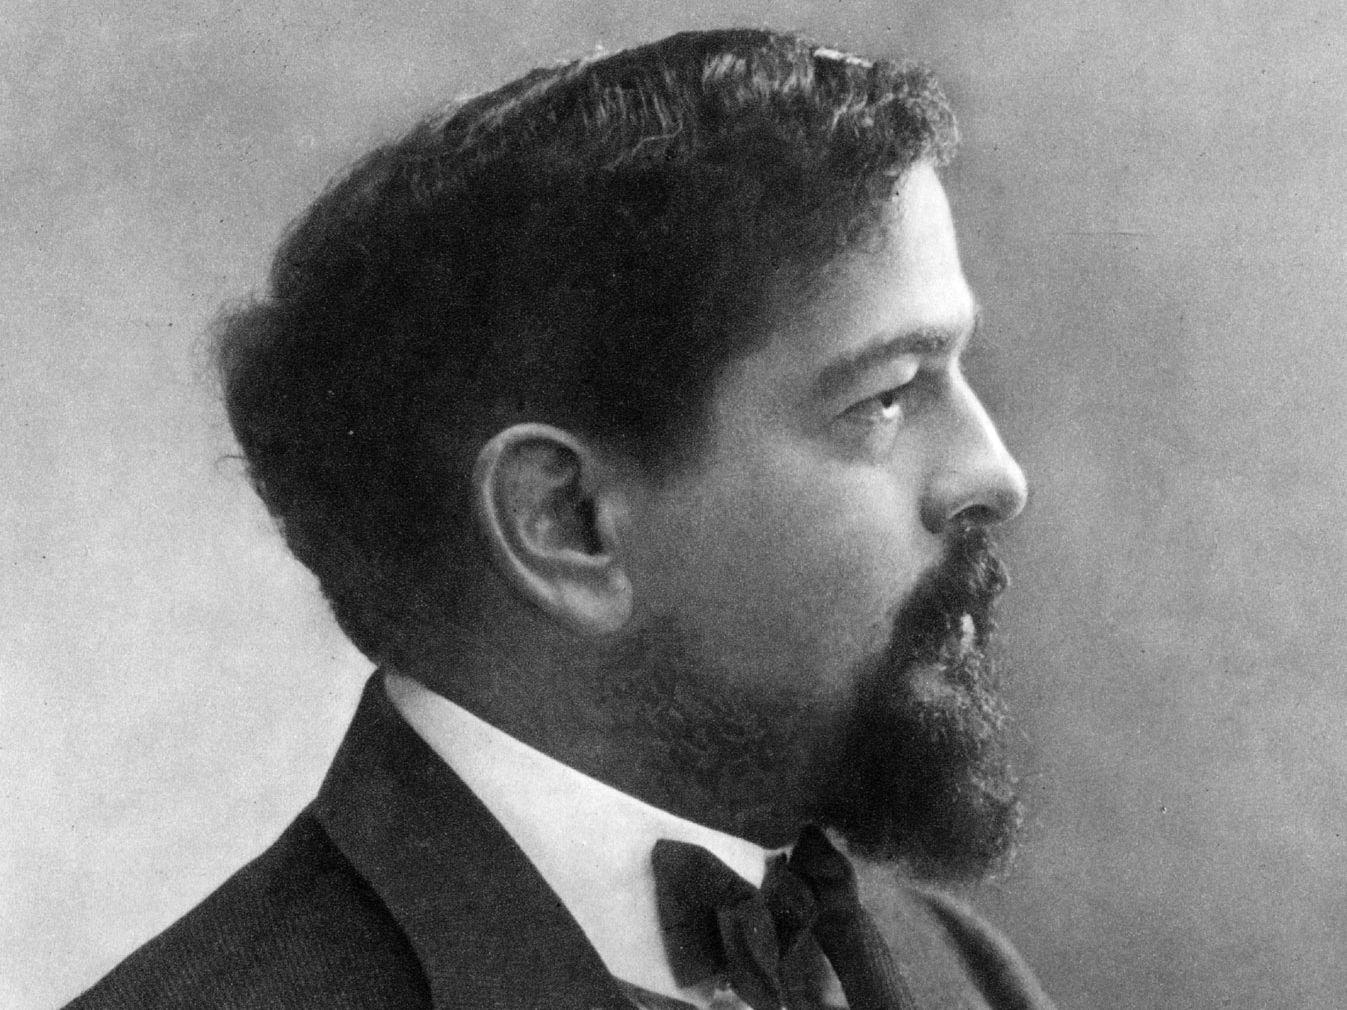 Analysis of Estampes Debussy (Pearson/Edexcel)